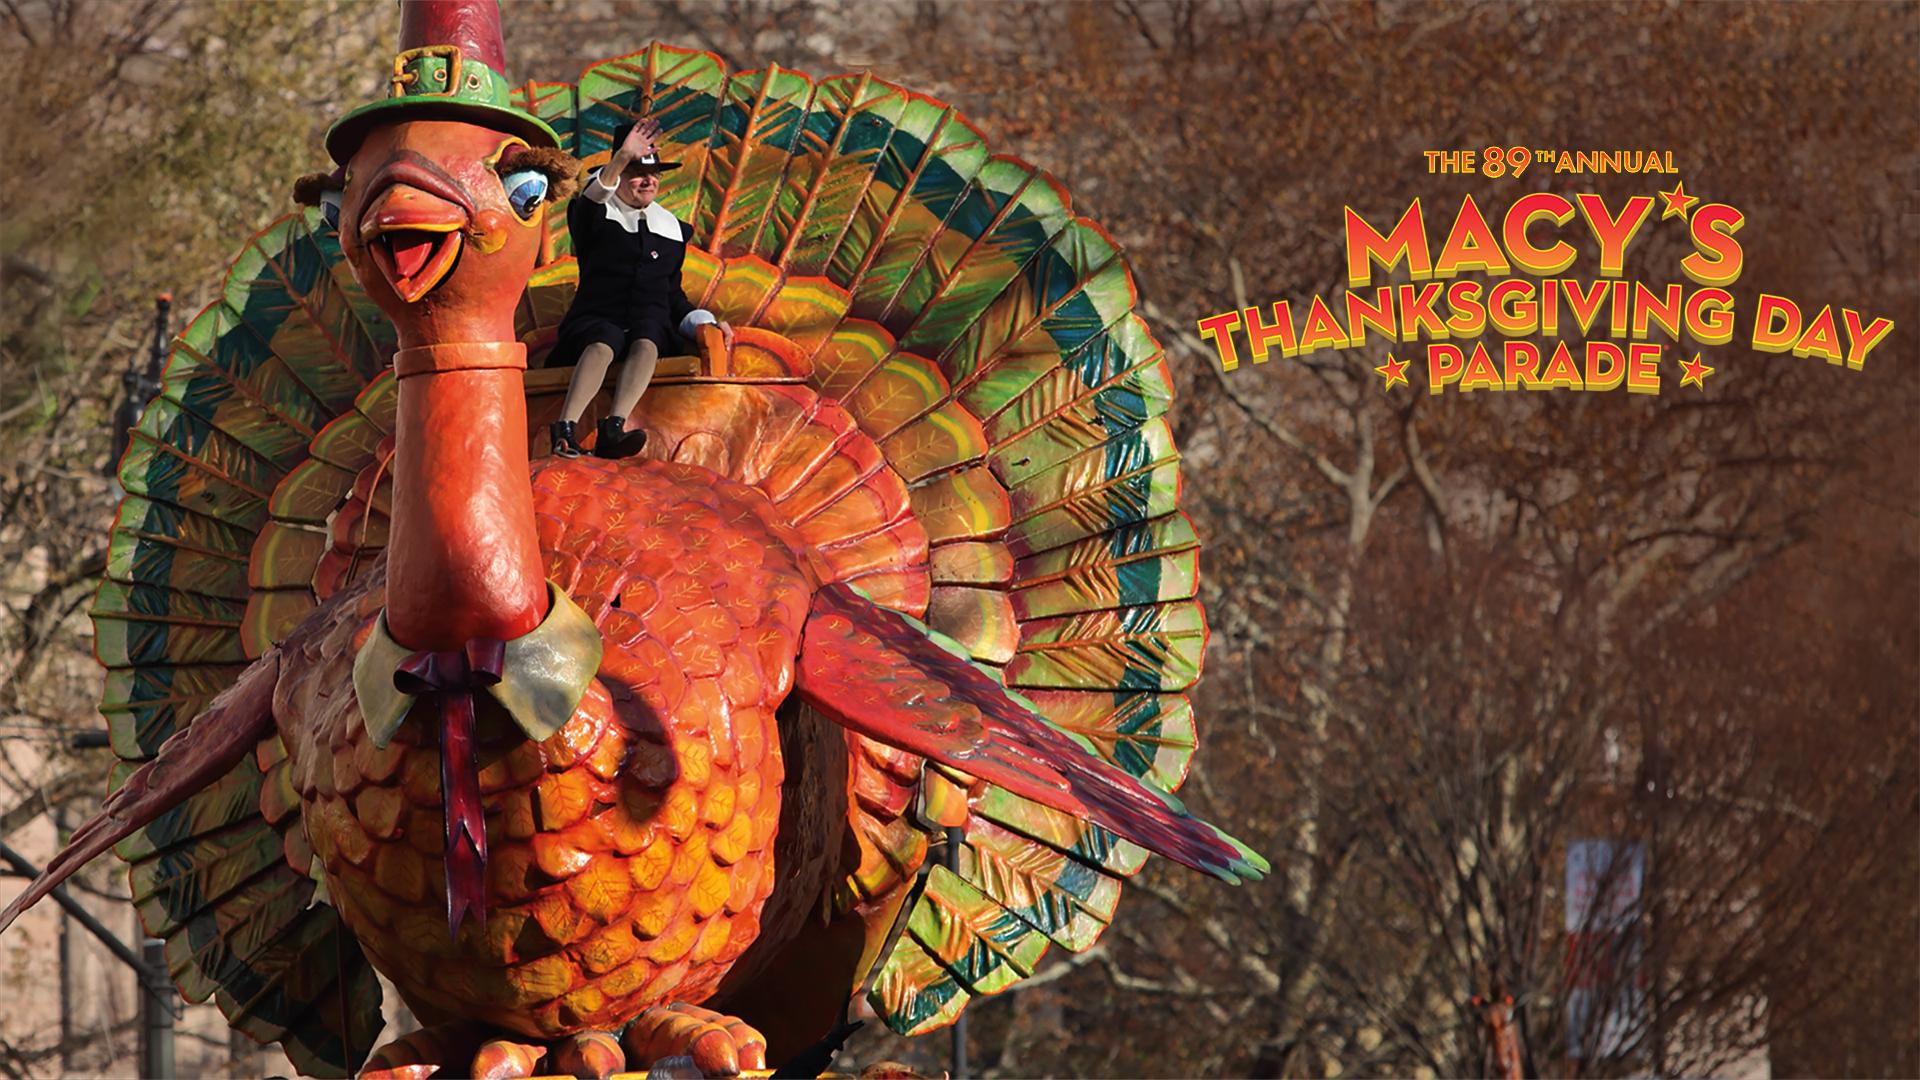 Macys Thanksgiving Day Parade Info   oukasinfo 1920x1080